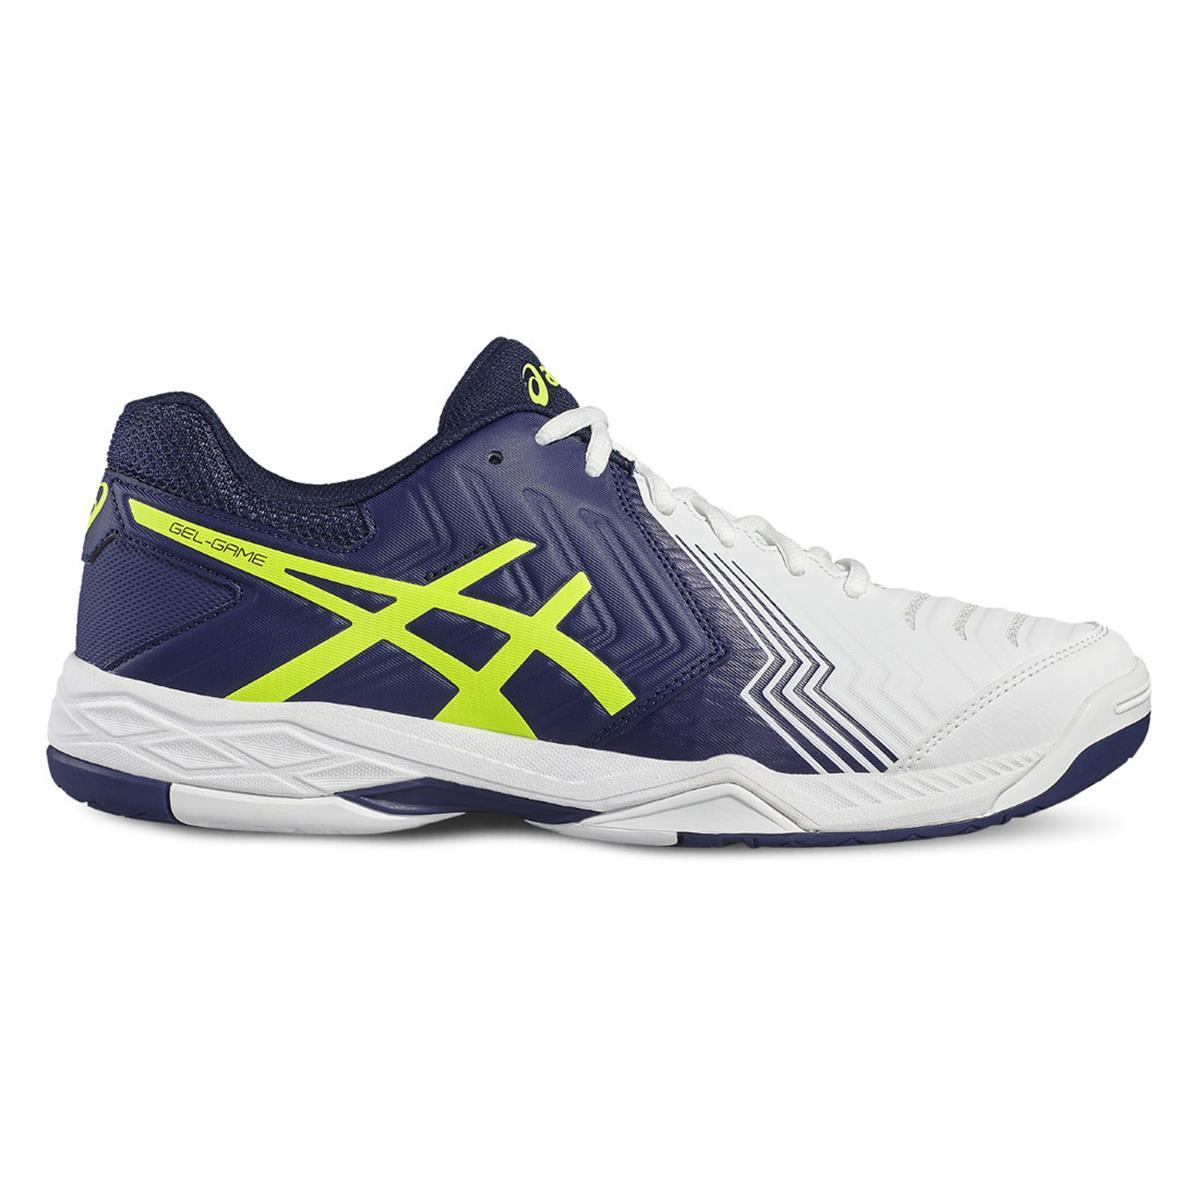 asics gel 6 mens tennis shoes by directsportseshop